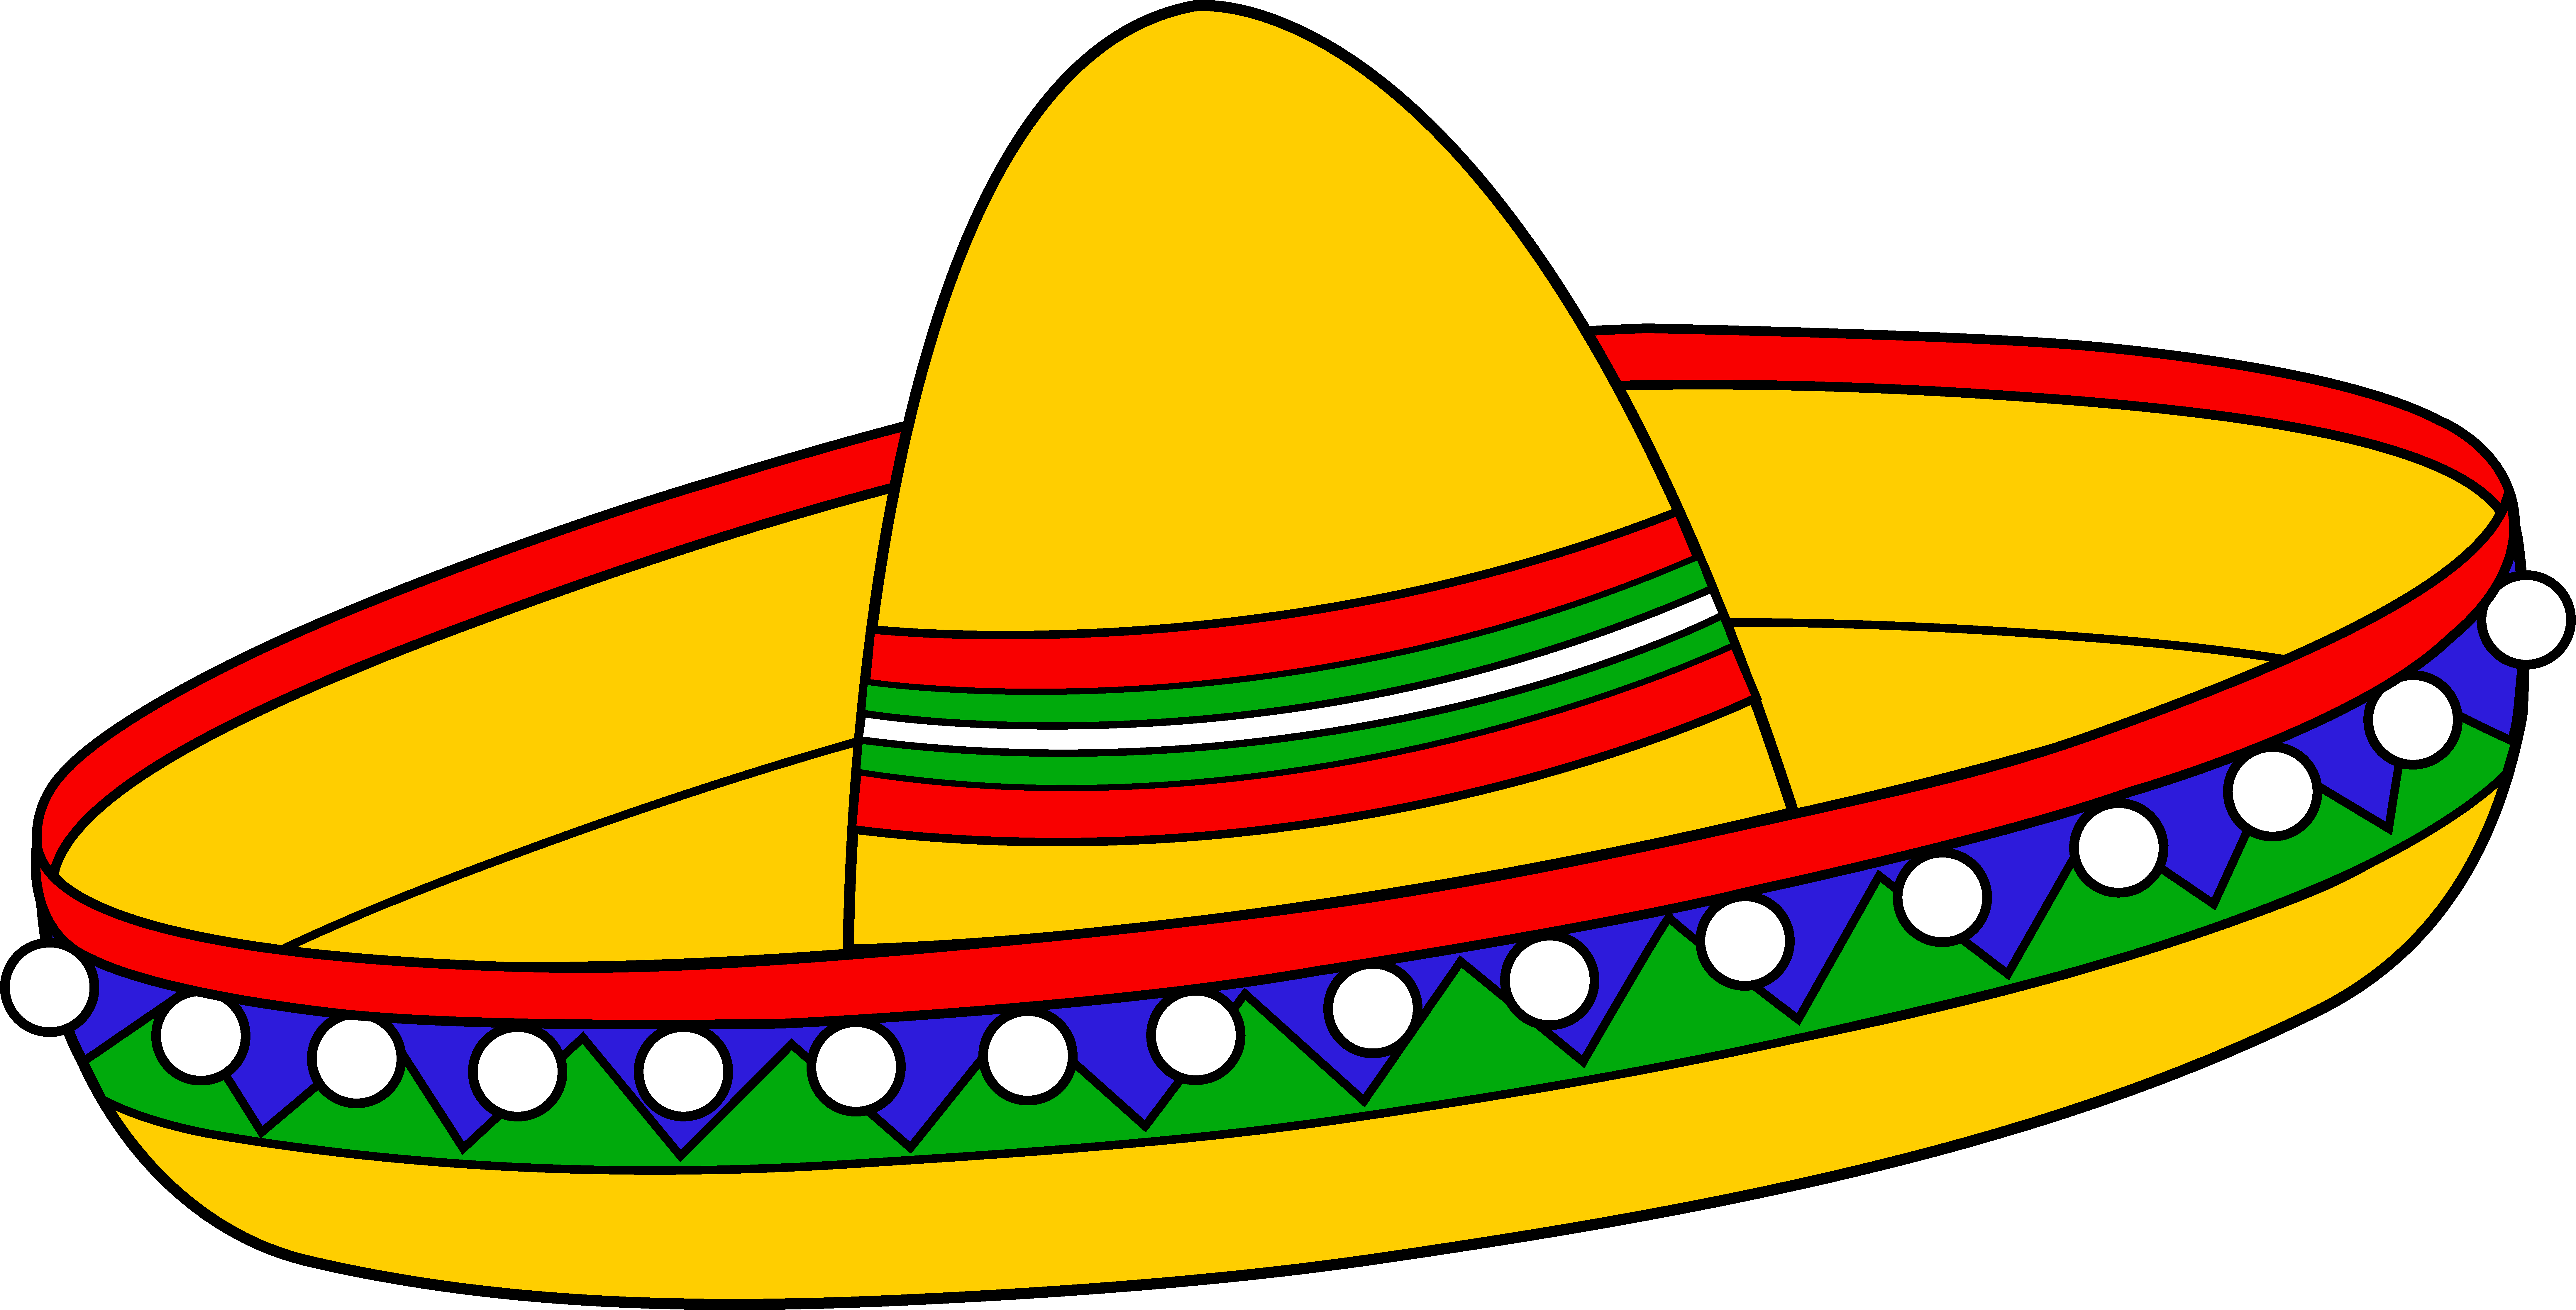 colorful mexican sombrero hat free clip art [ 8783 x 4467 Pixel ]